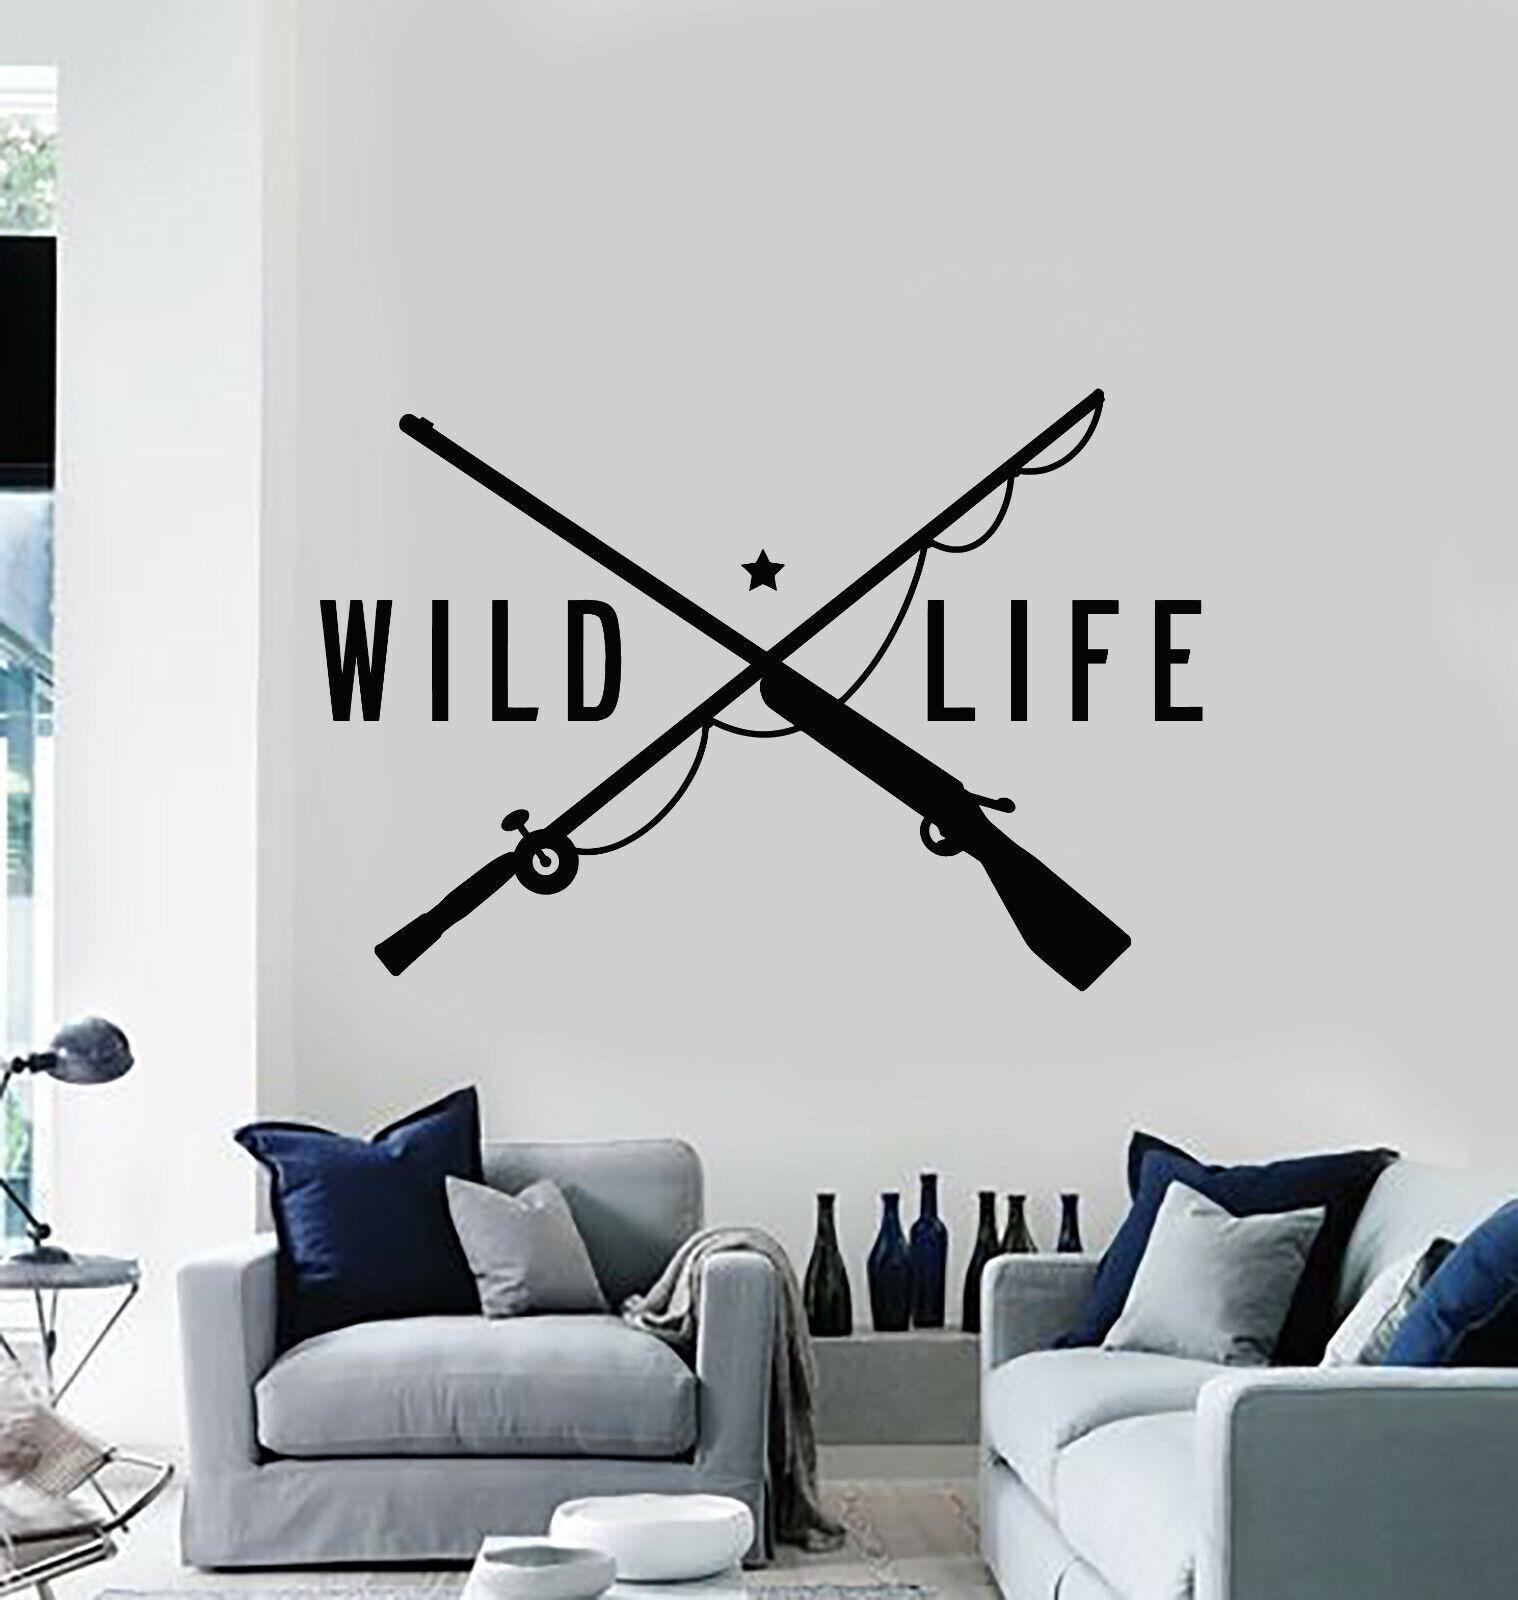 Vinyl Wall Decal Wild Life Gun Fishing Rod Hunting Store Decor Stickers (g961)